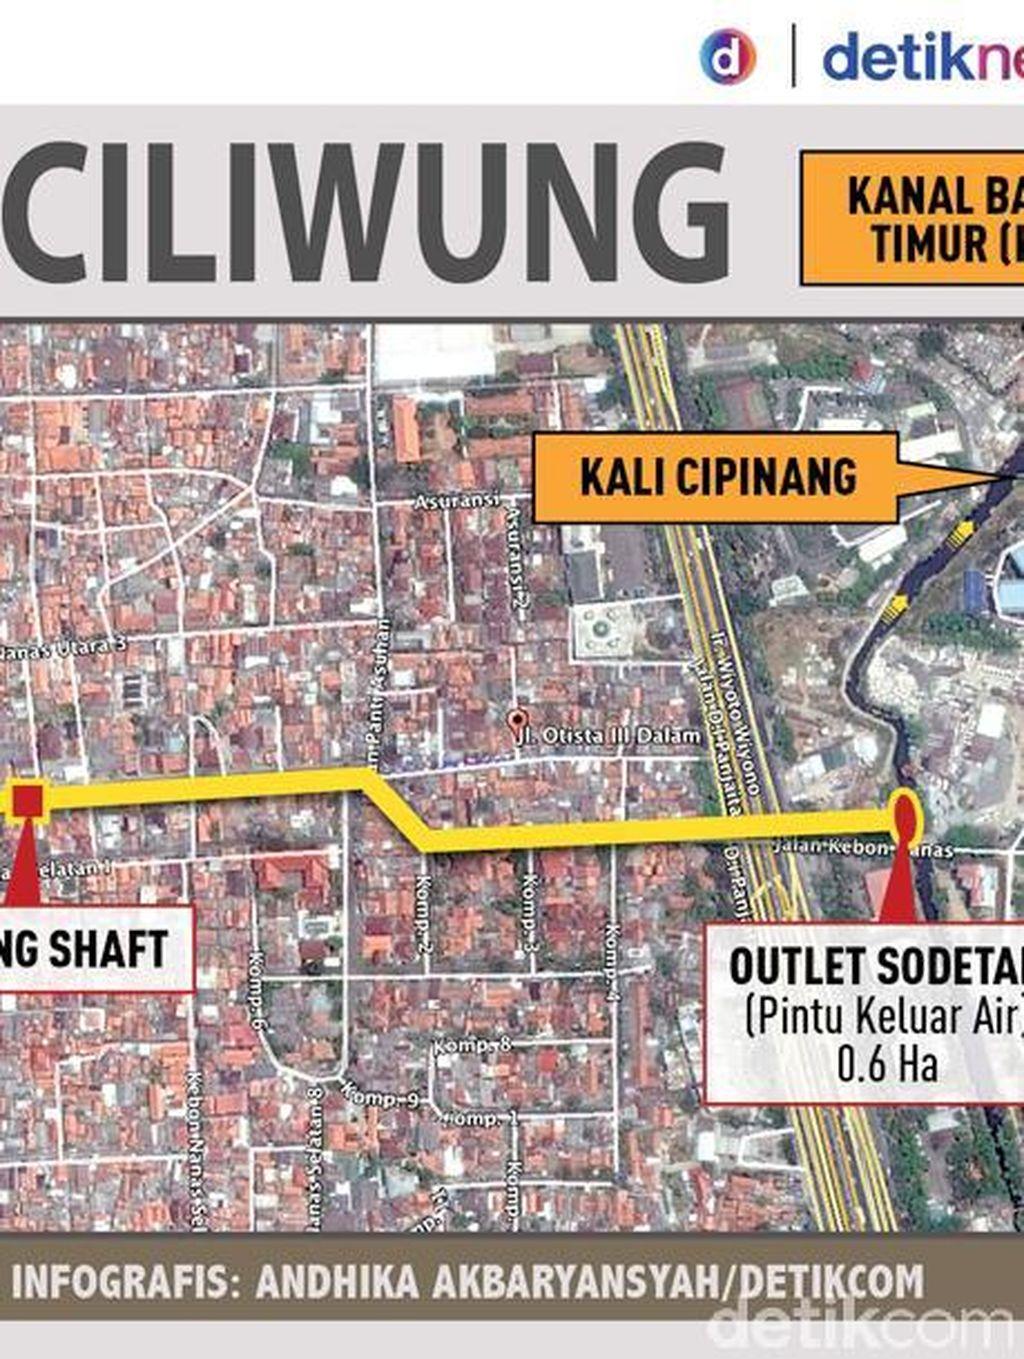 Jalur Sodetan Ciliwung